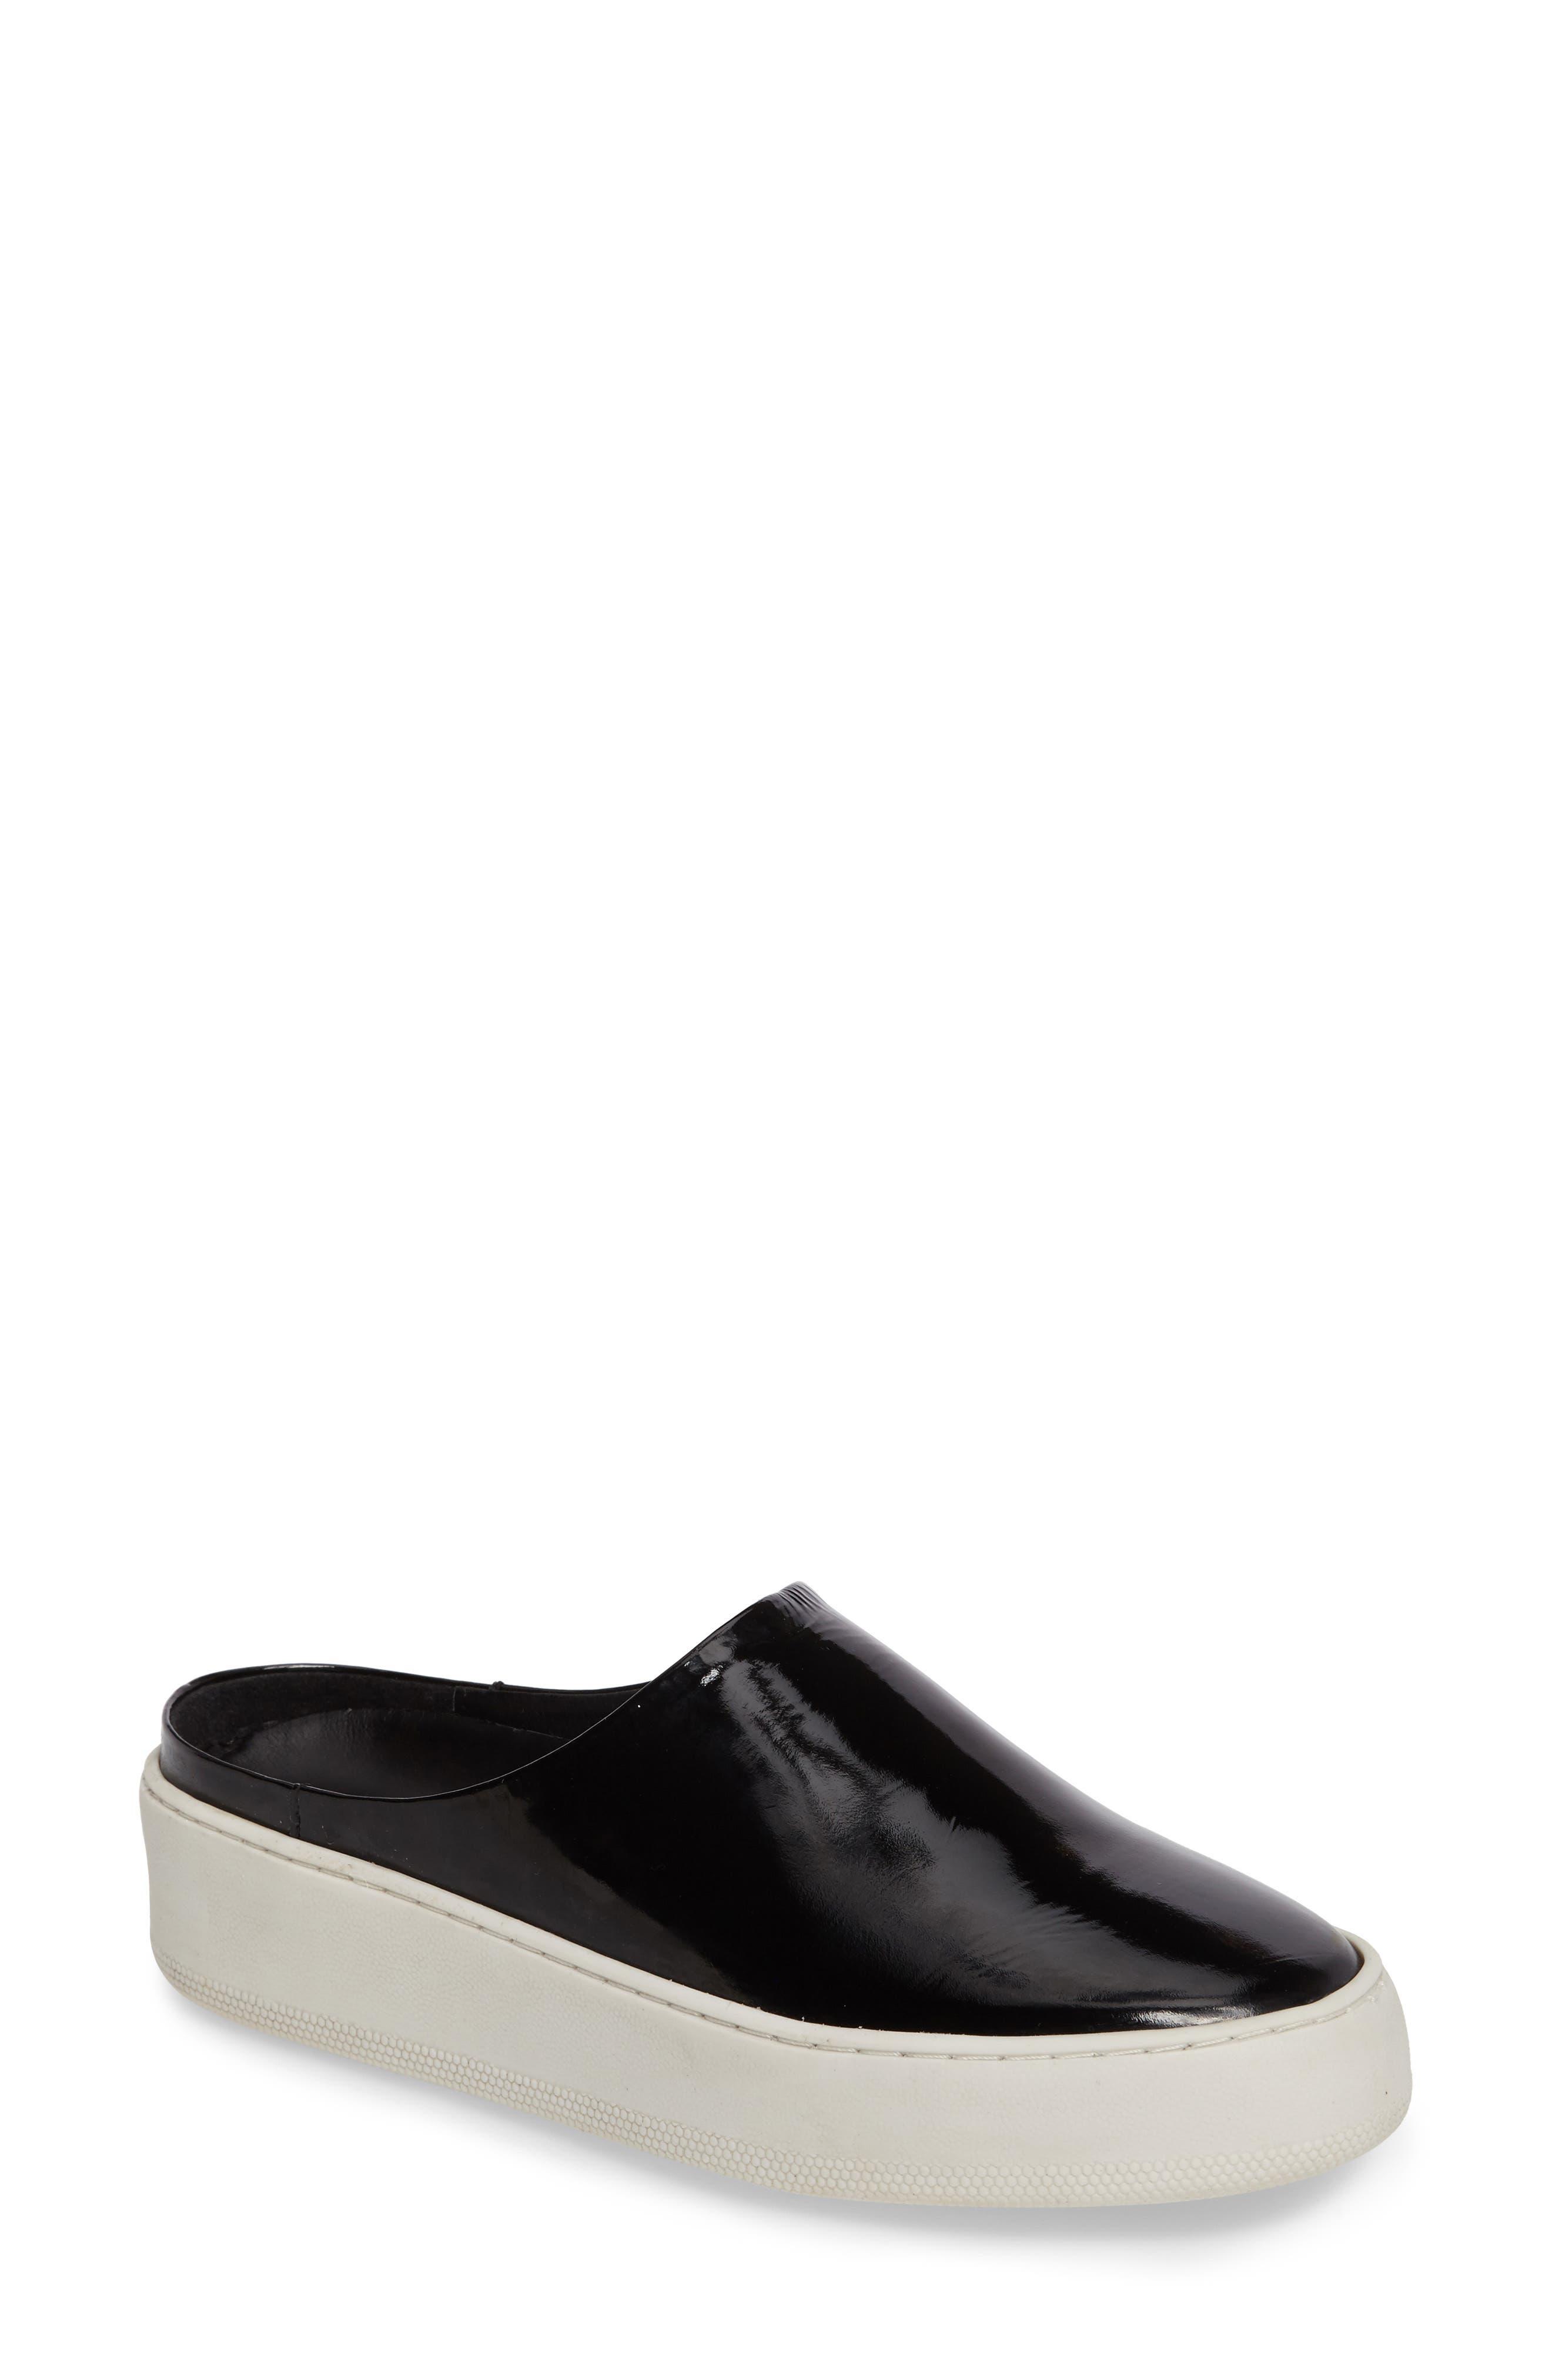 Main Image - Free People Wynwood Slip-On Sneaker (Women)